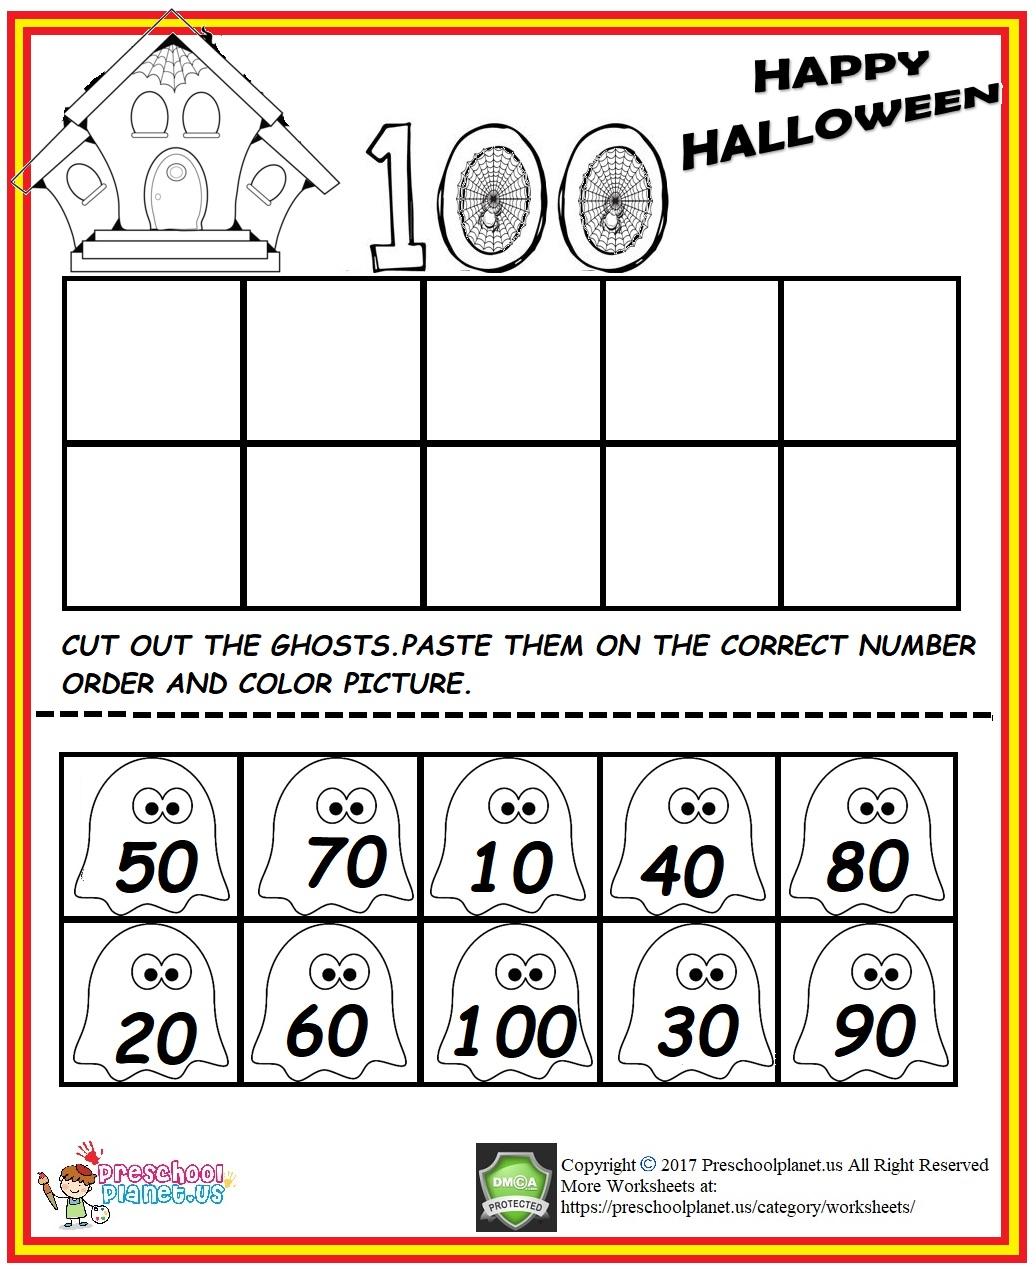 Ant Craft Ideas Preschoolplanet